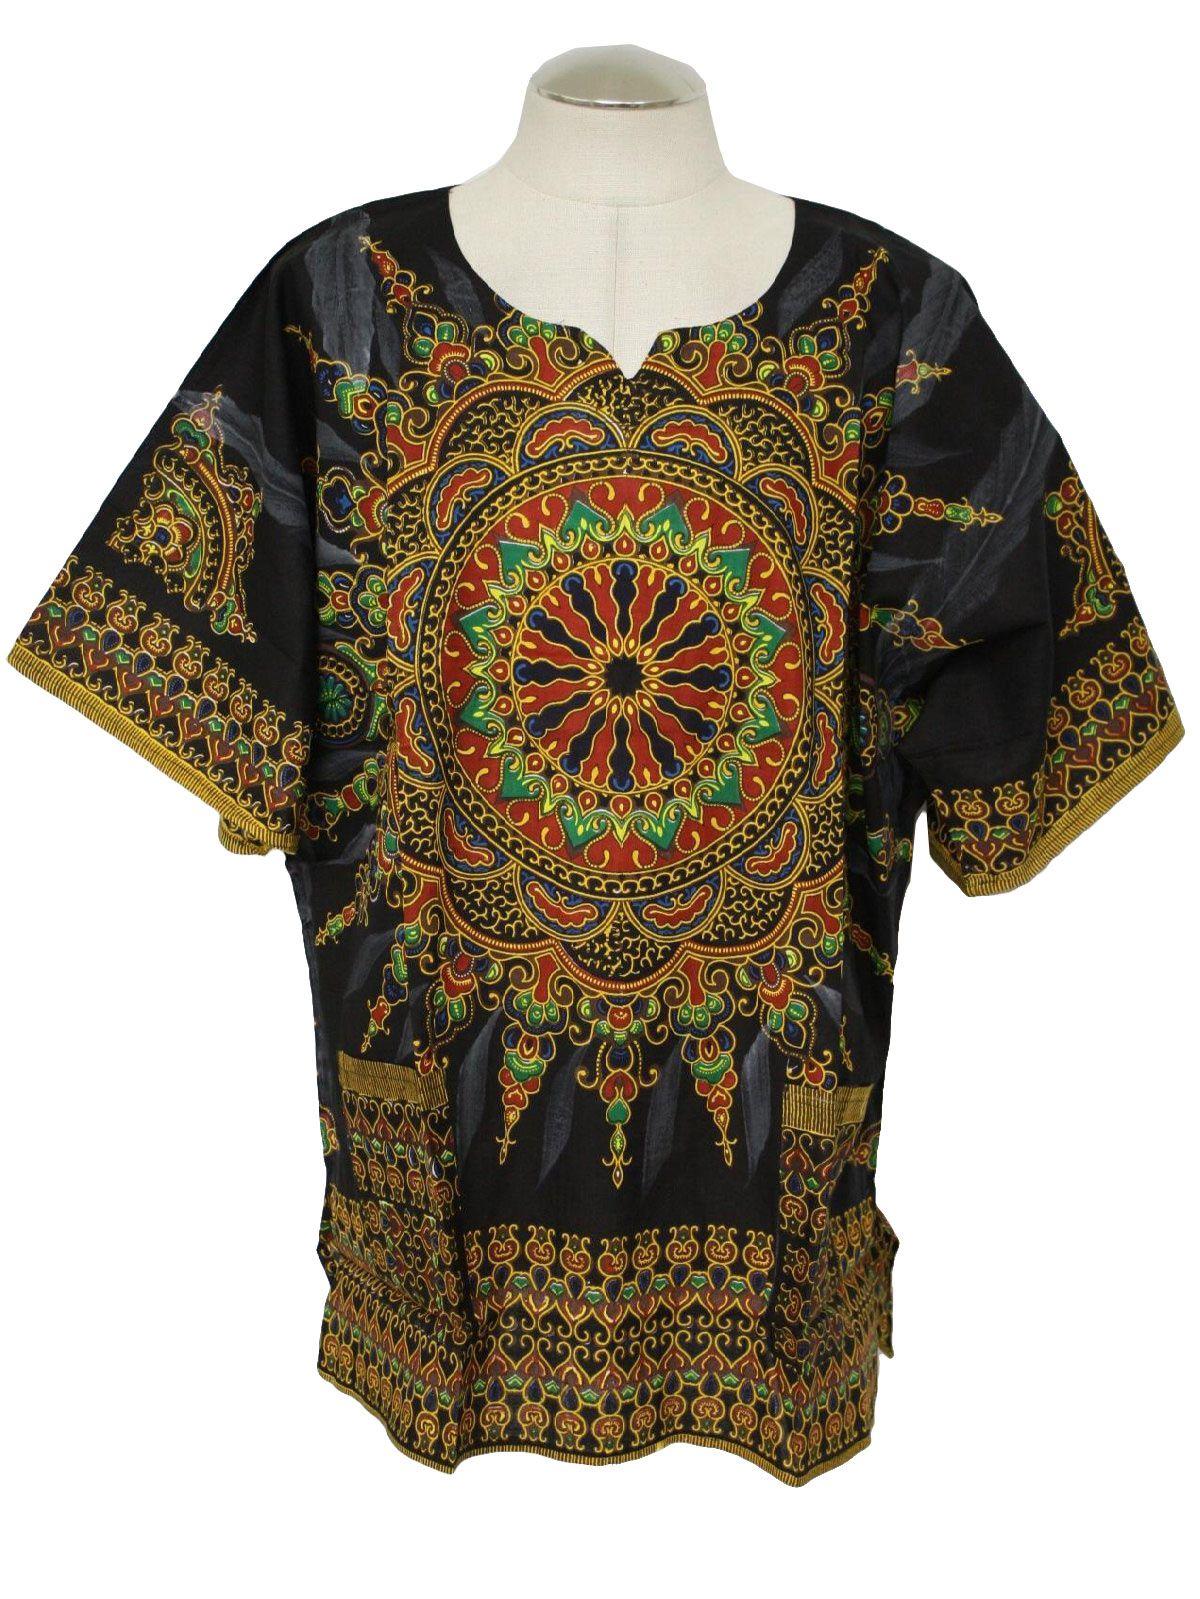 70s oversized dashiki shirt BJklU